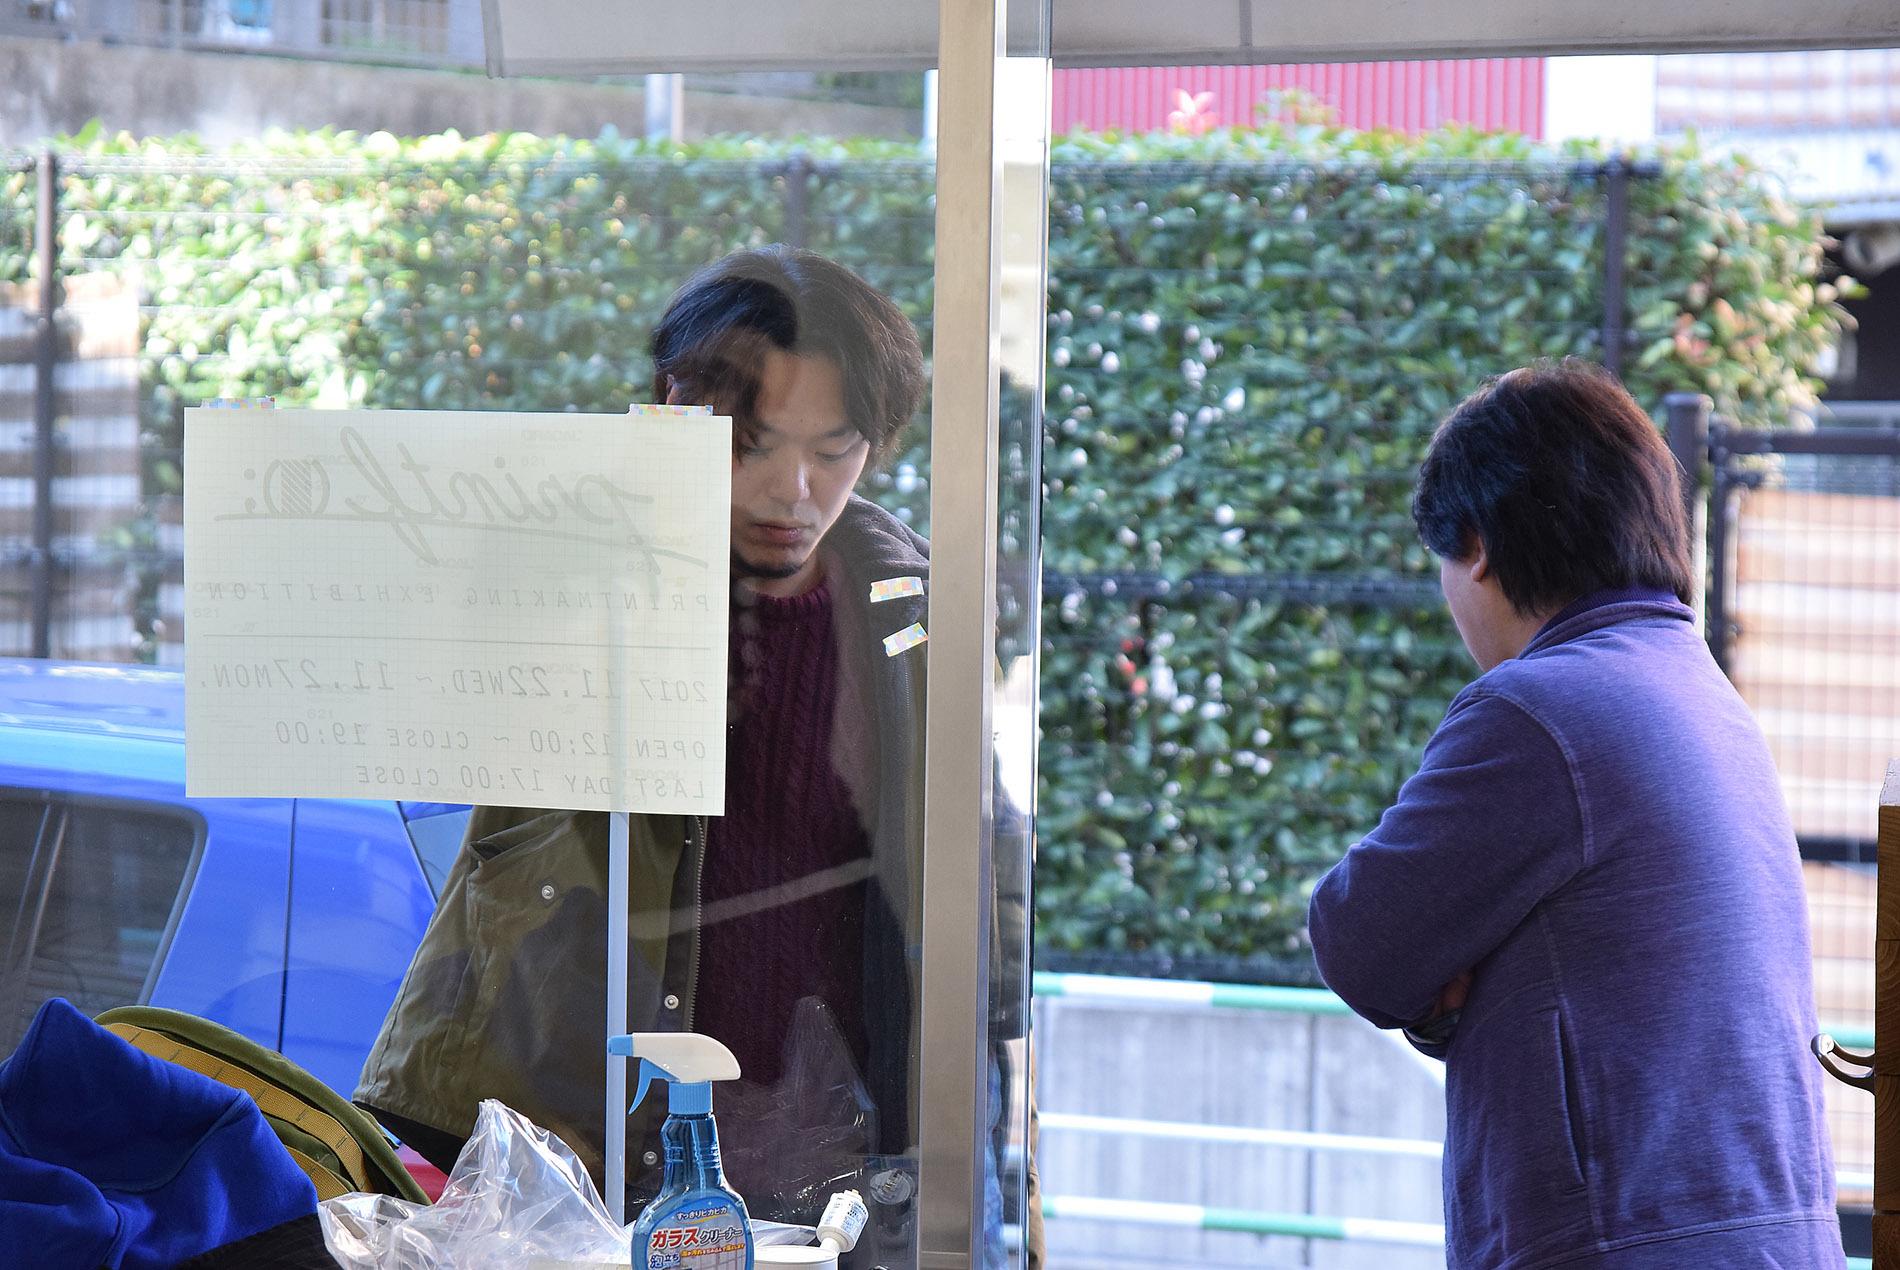 printf (); プリントエフ@搬入~初日_e0272050_17280560.jpg